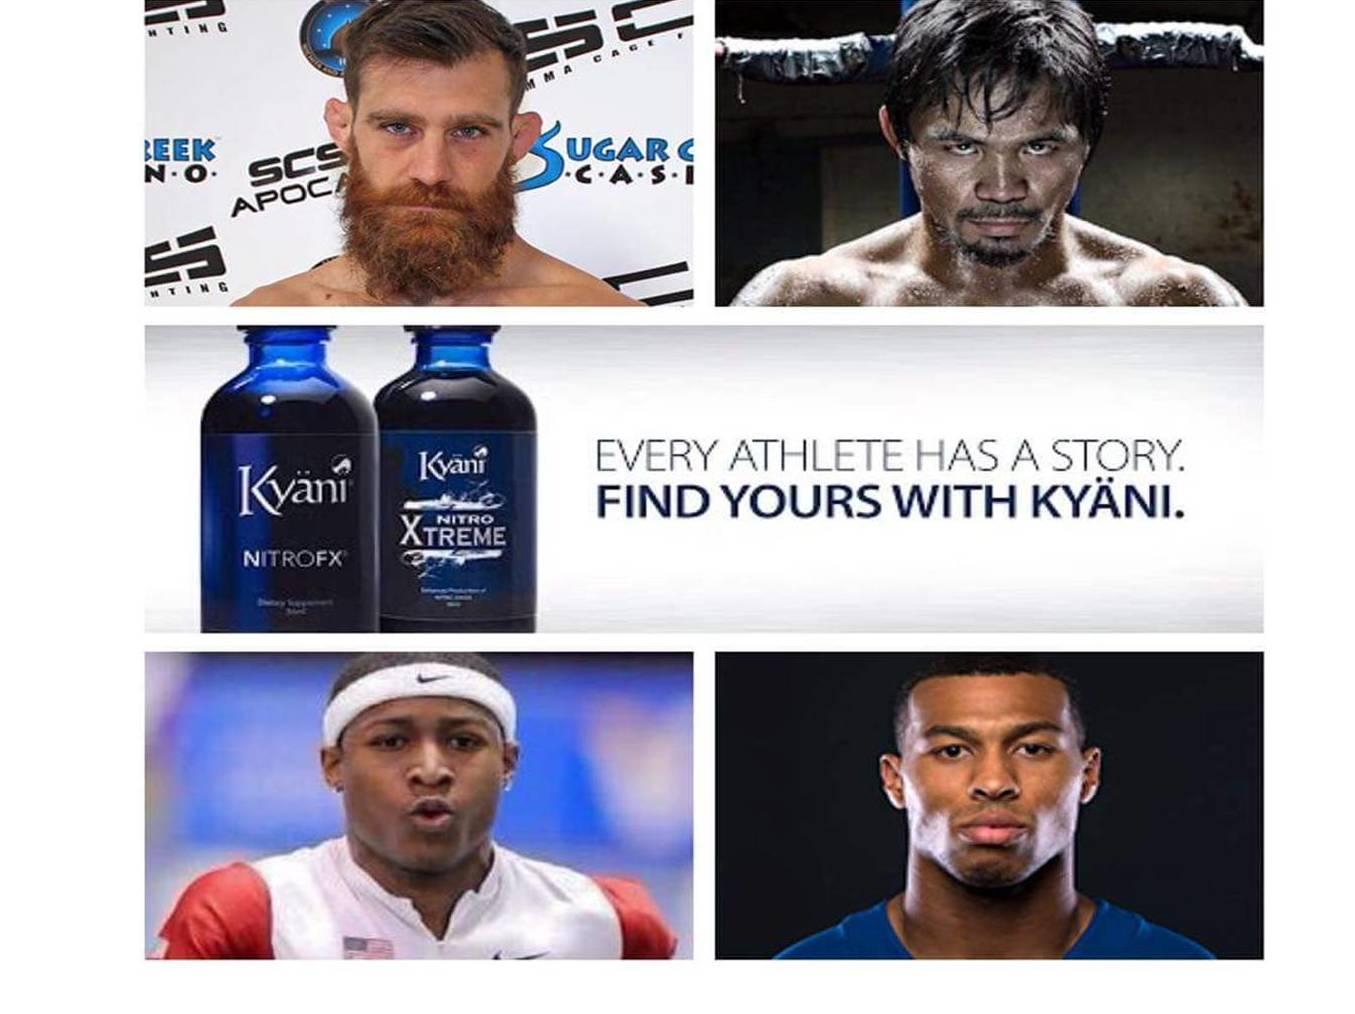 Suplementos Kyani deportistas de élite